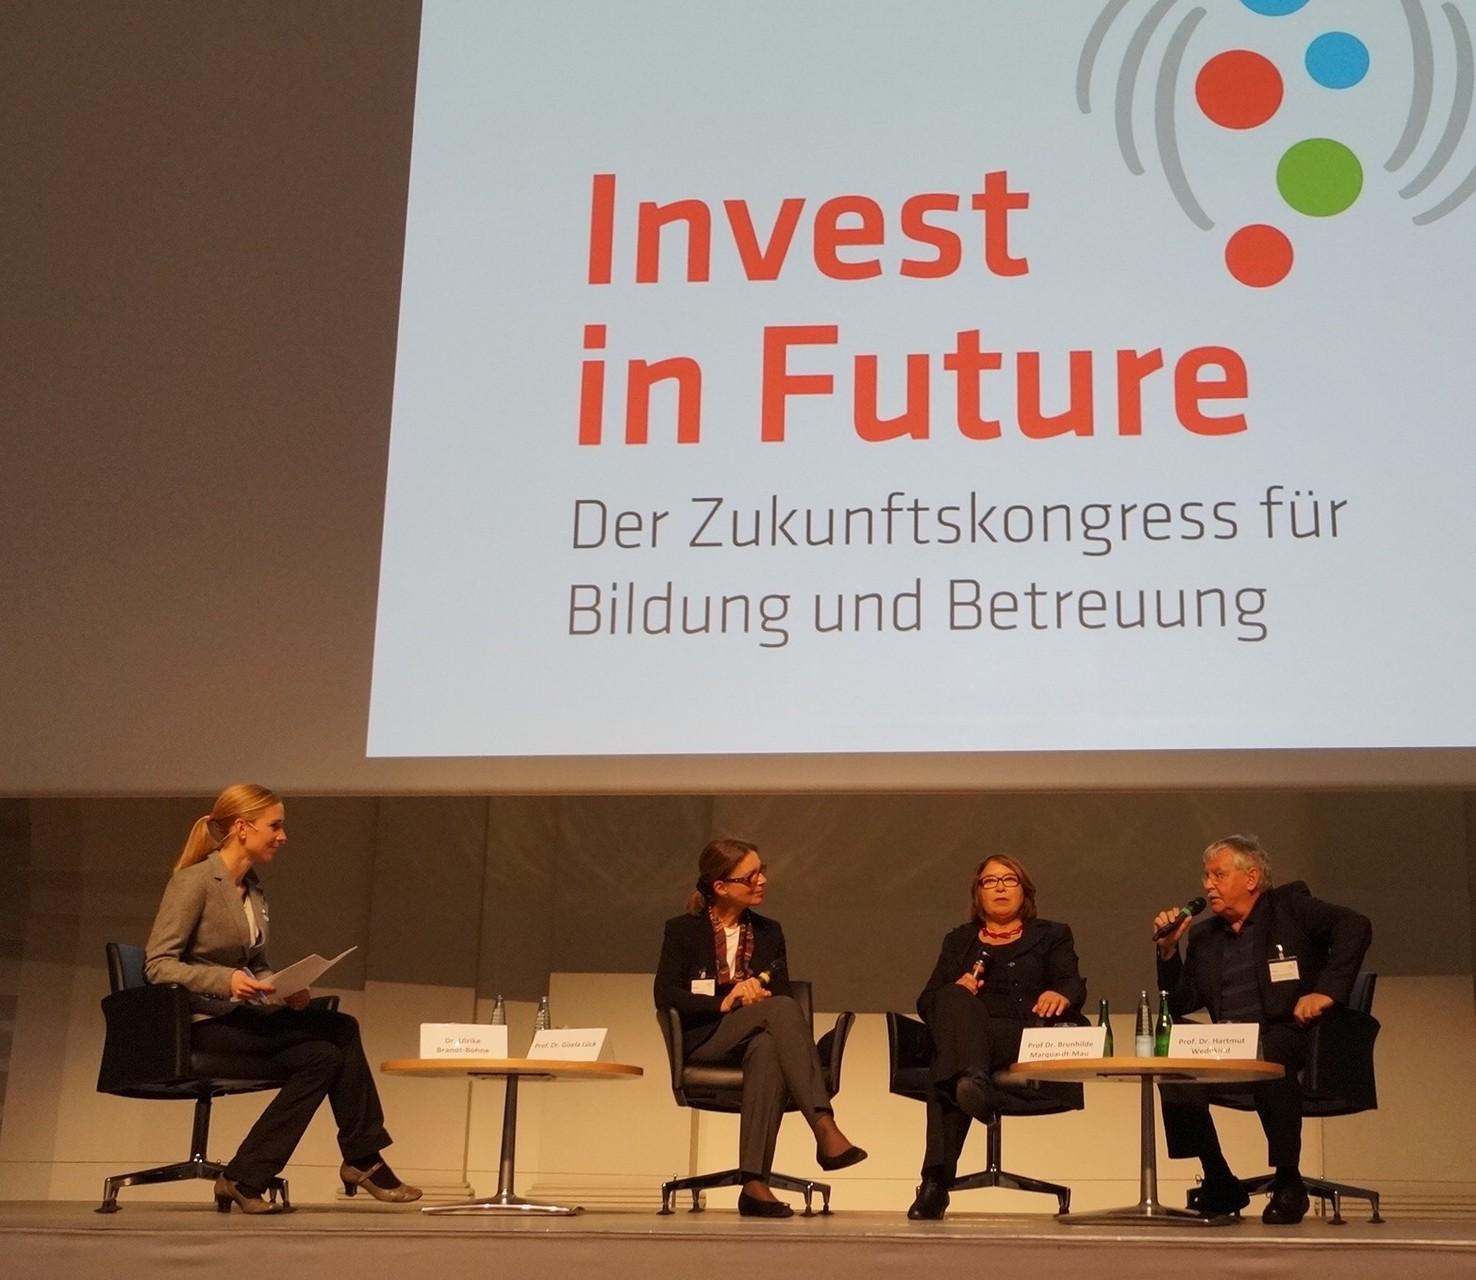 Podiumsdiskussion Invest in Future Zukunftskongress 2015 @Invest In Future